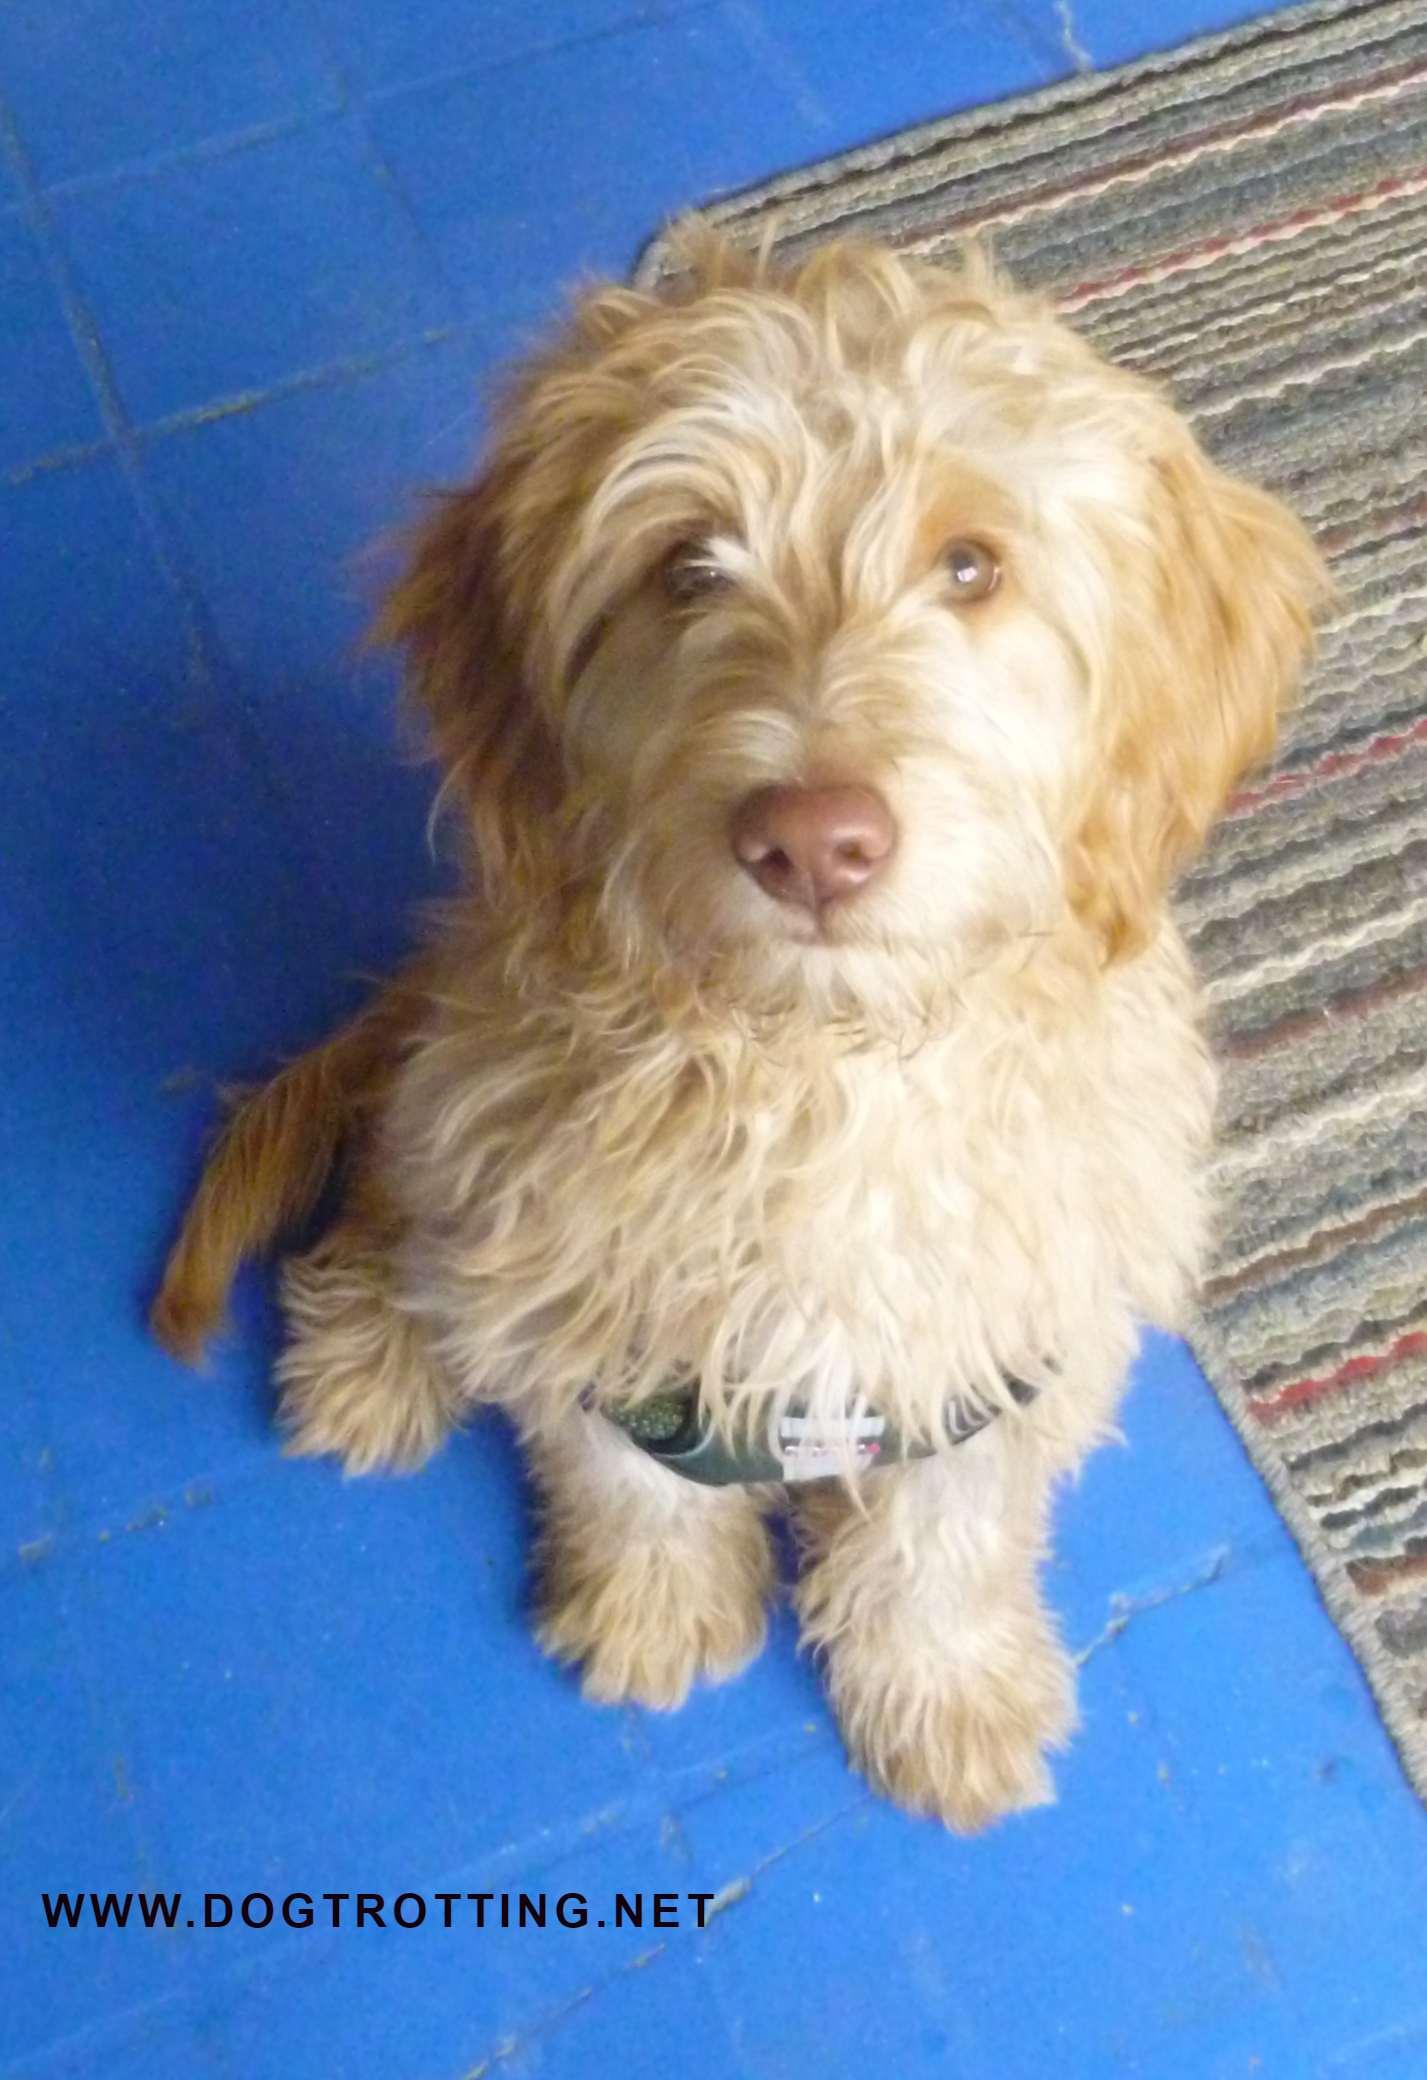 cute beigh shaggy dog at My Dog's Cafe in Hamilton, Ontario